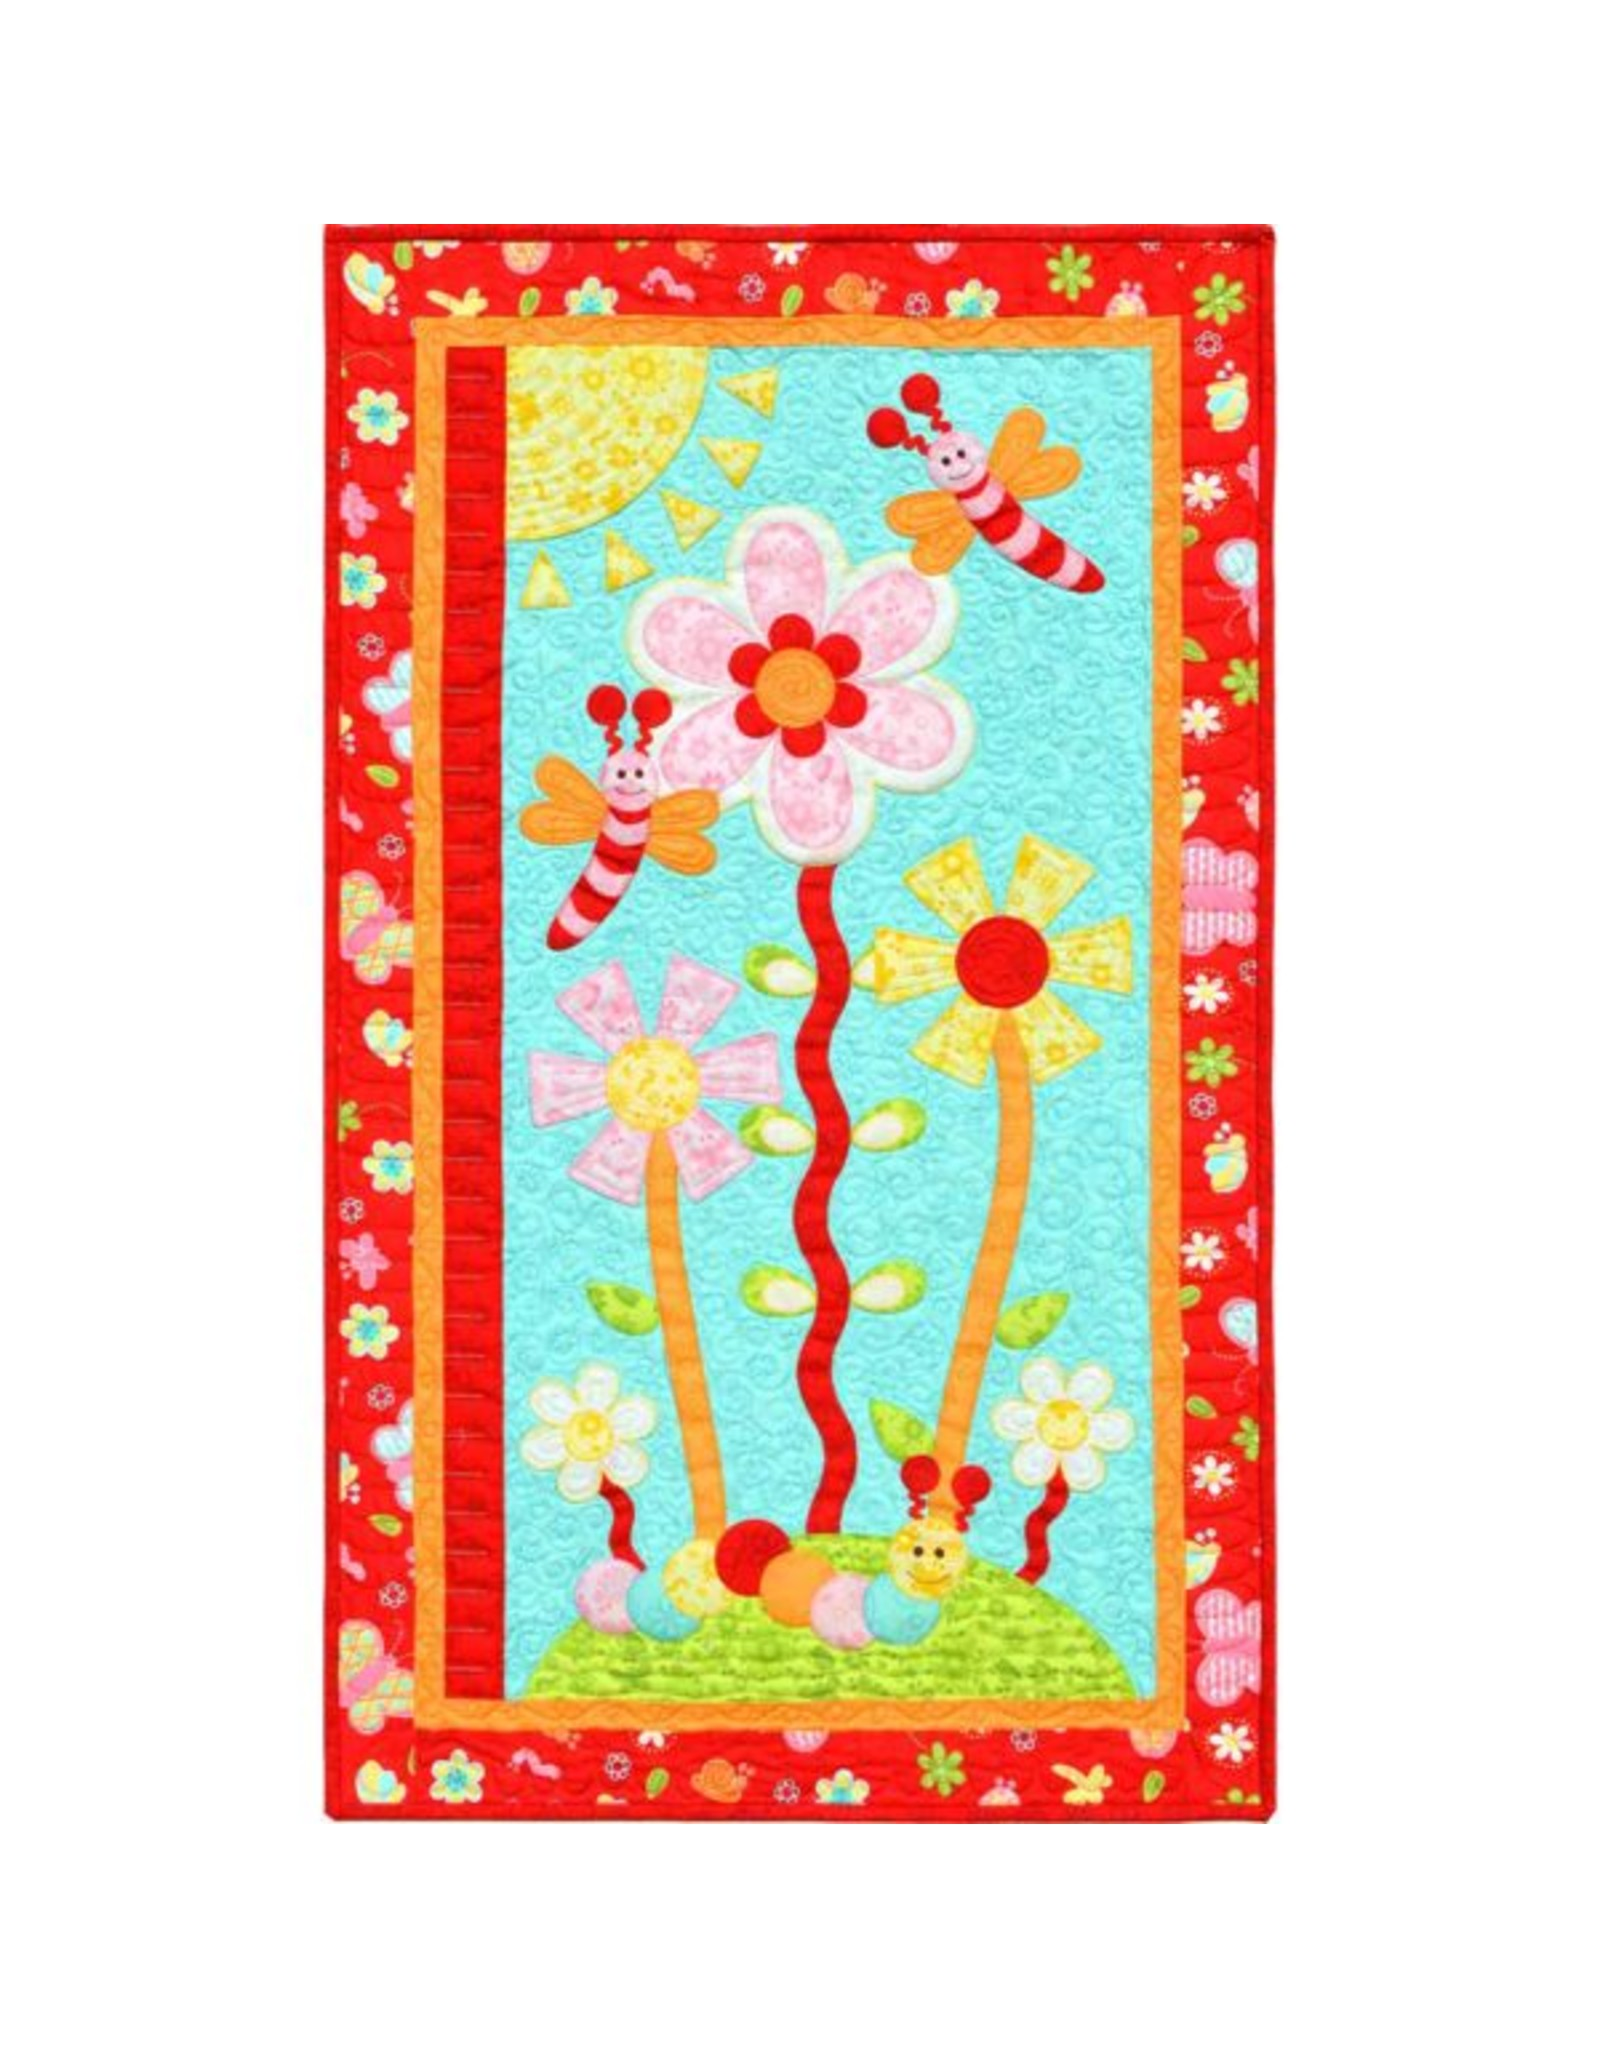 Kids Quilts Budding Blooms - applique patroon voor wandquiltje